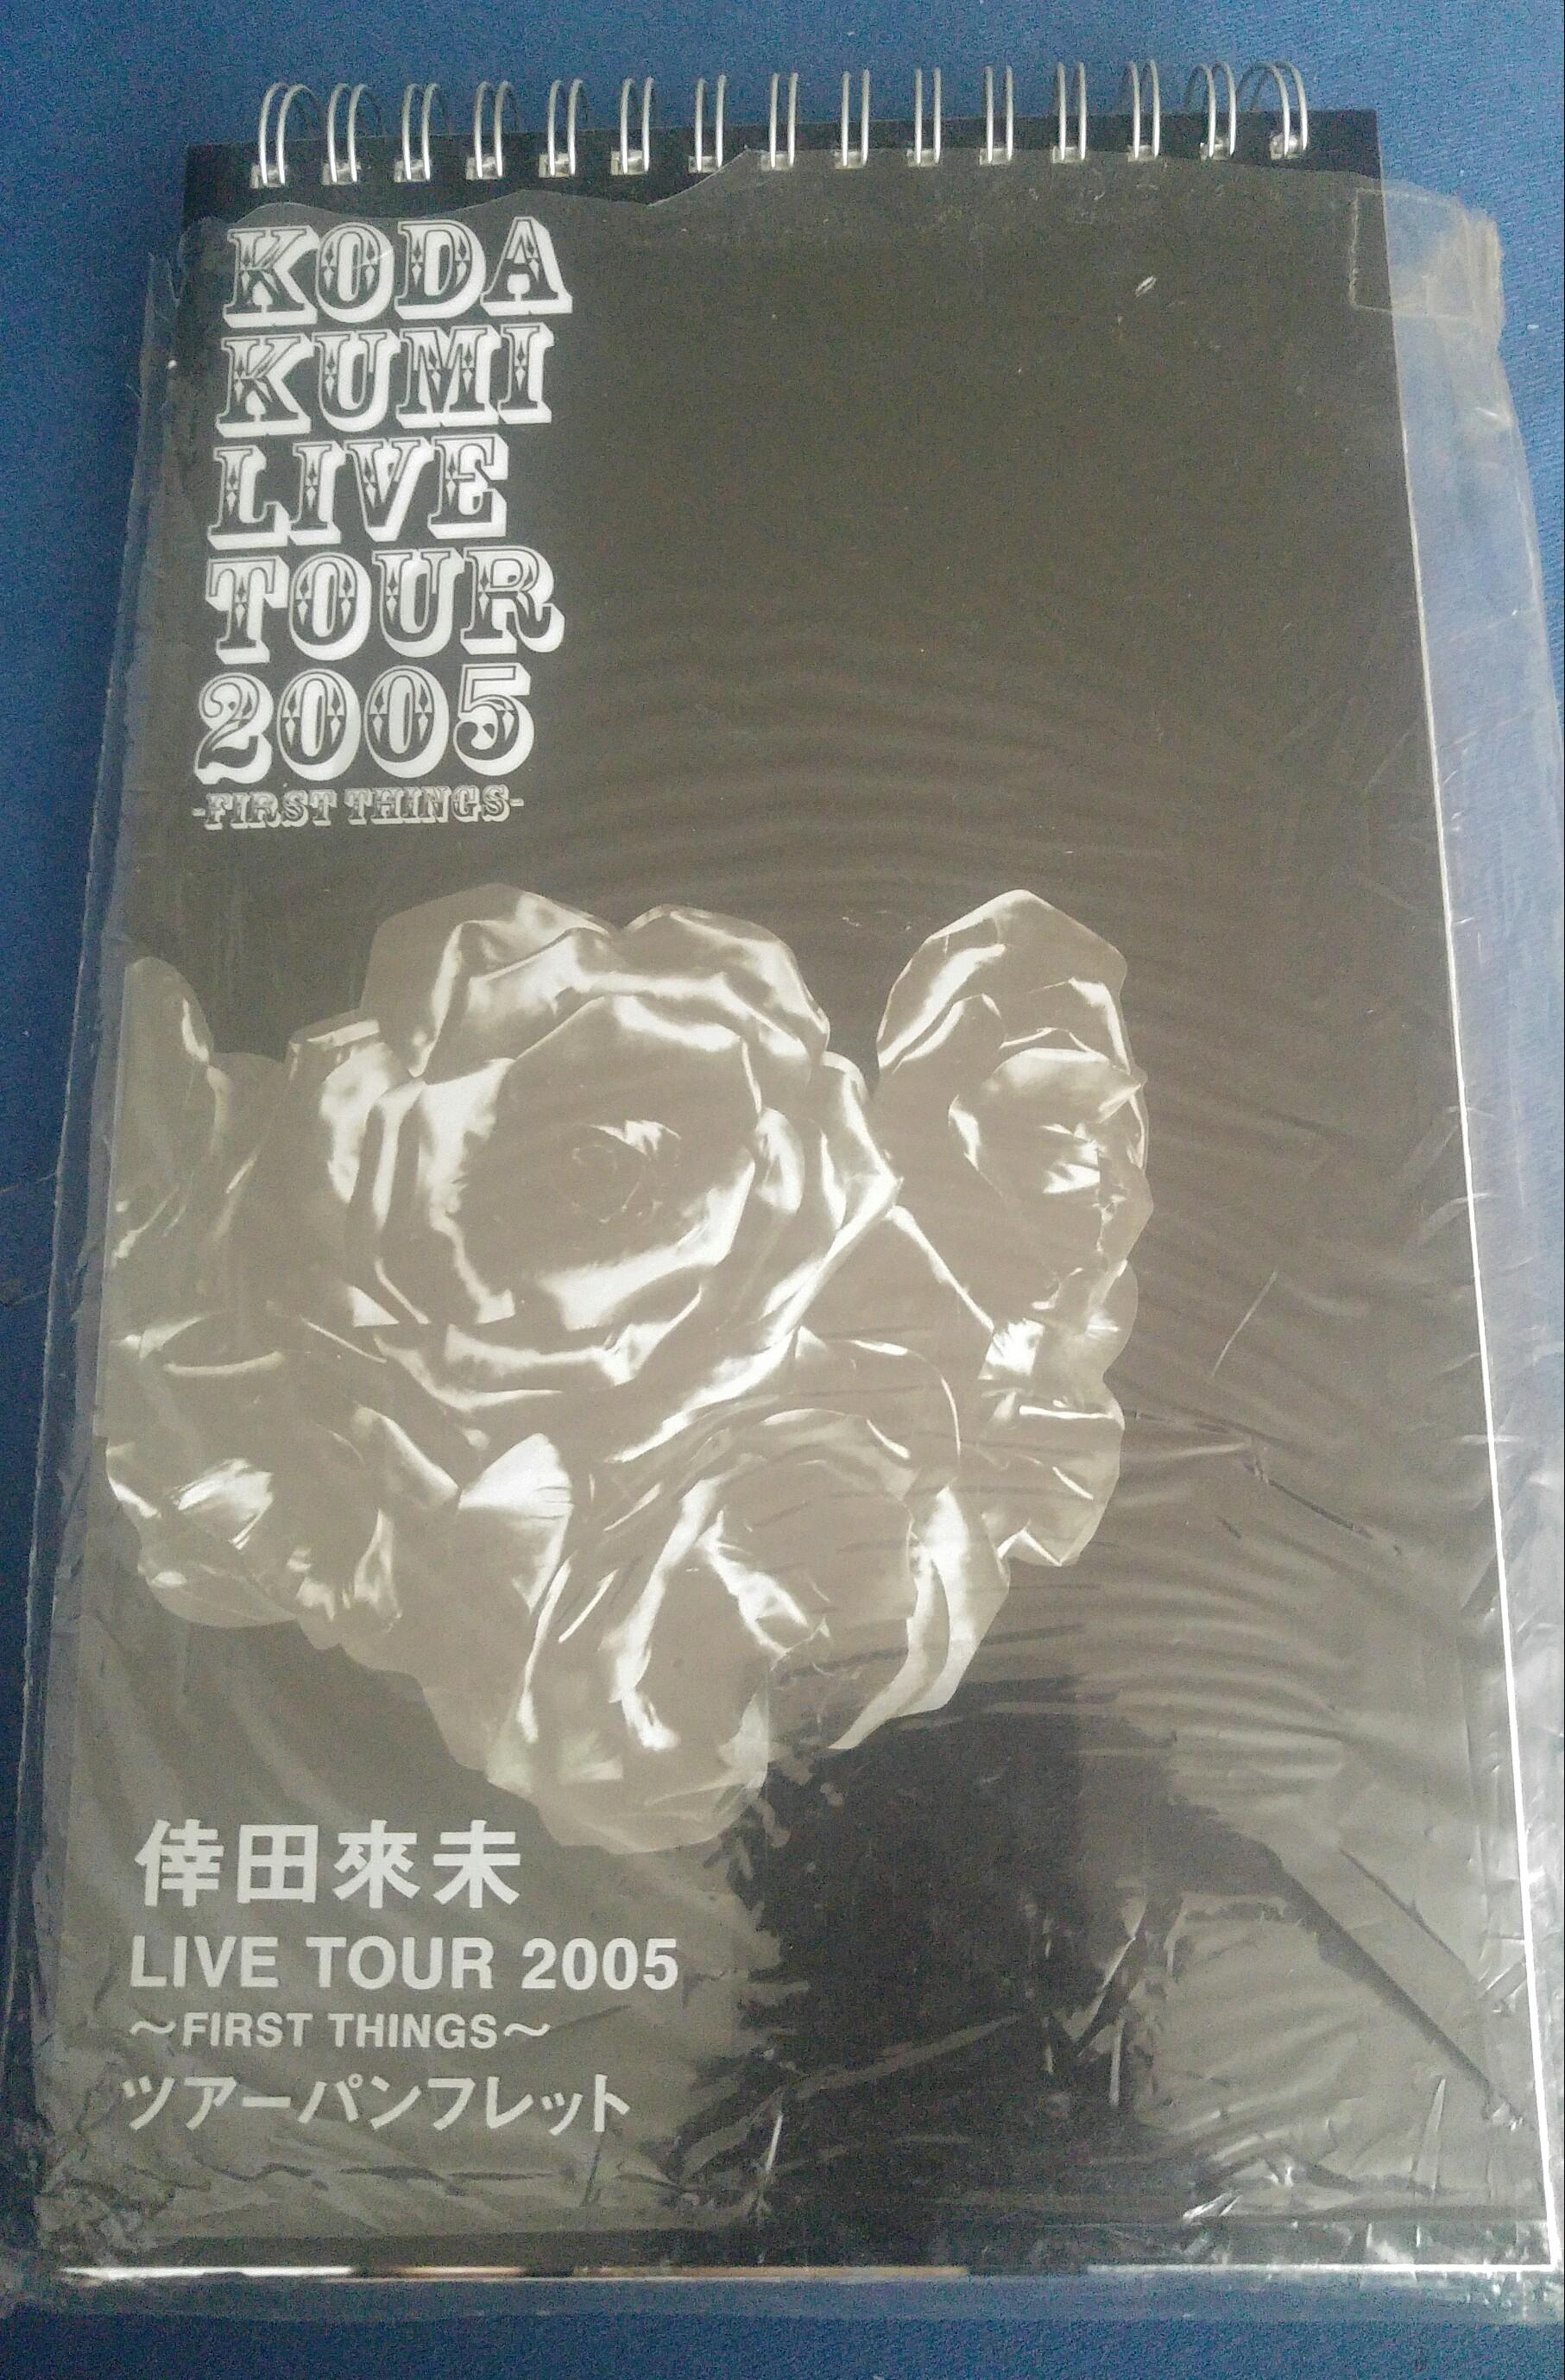 KODA KUMI LIVE TOUR 2005 ~first things~